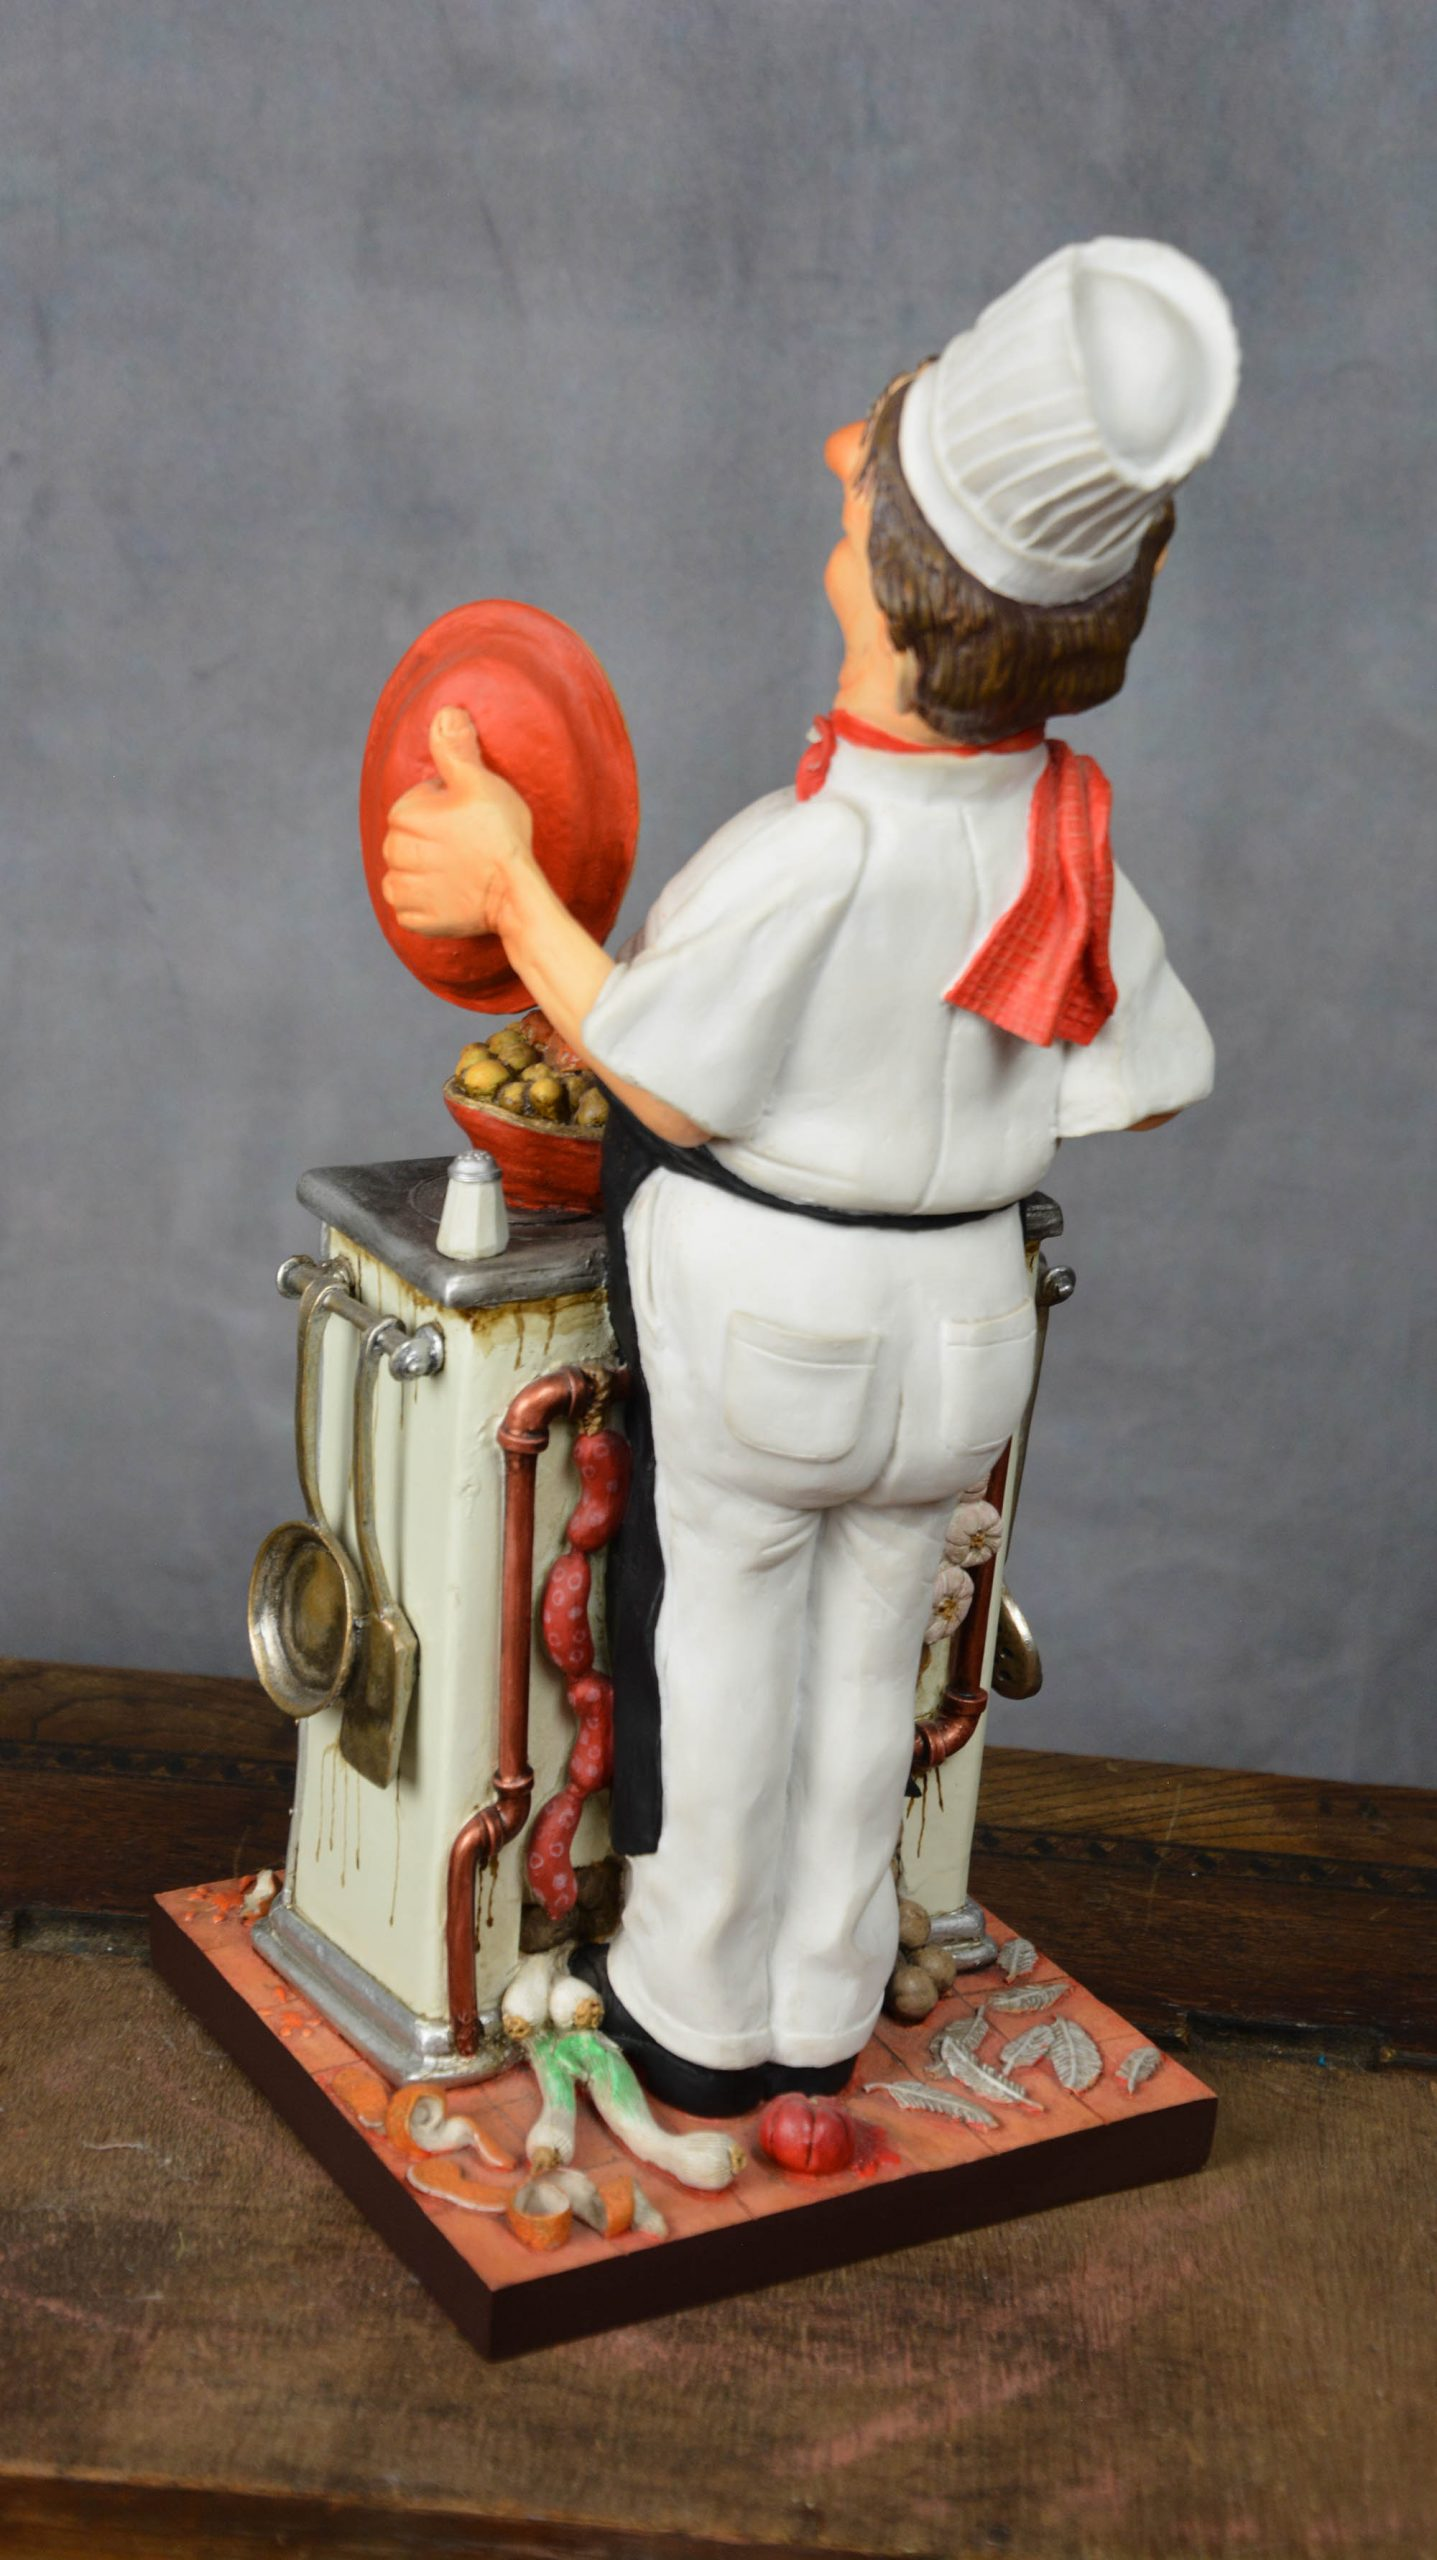 boutique figurine piece artisanale personnage cuisinier parodie